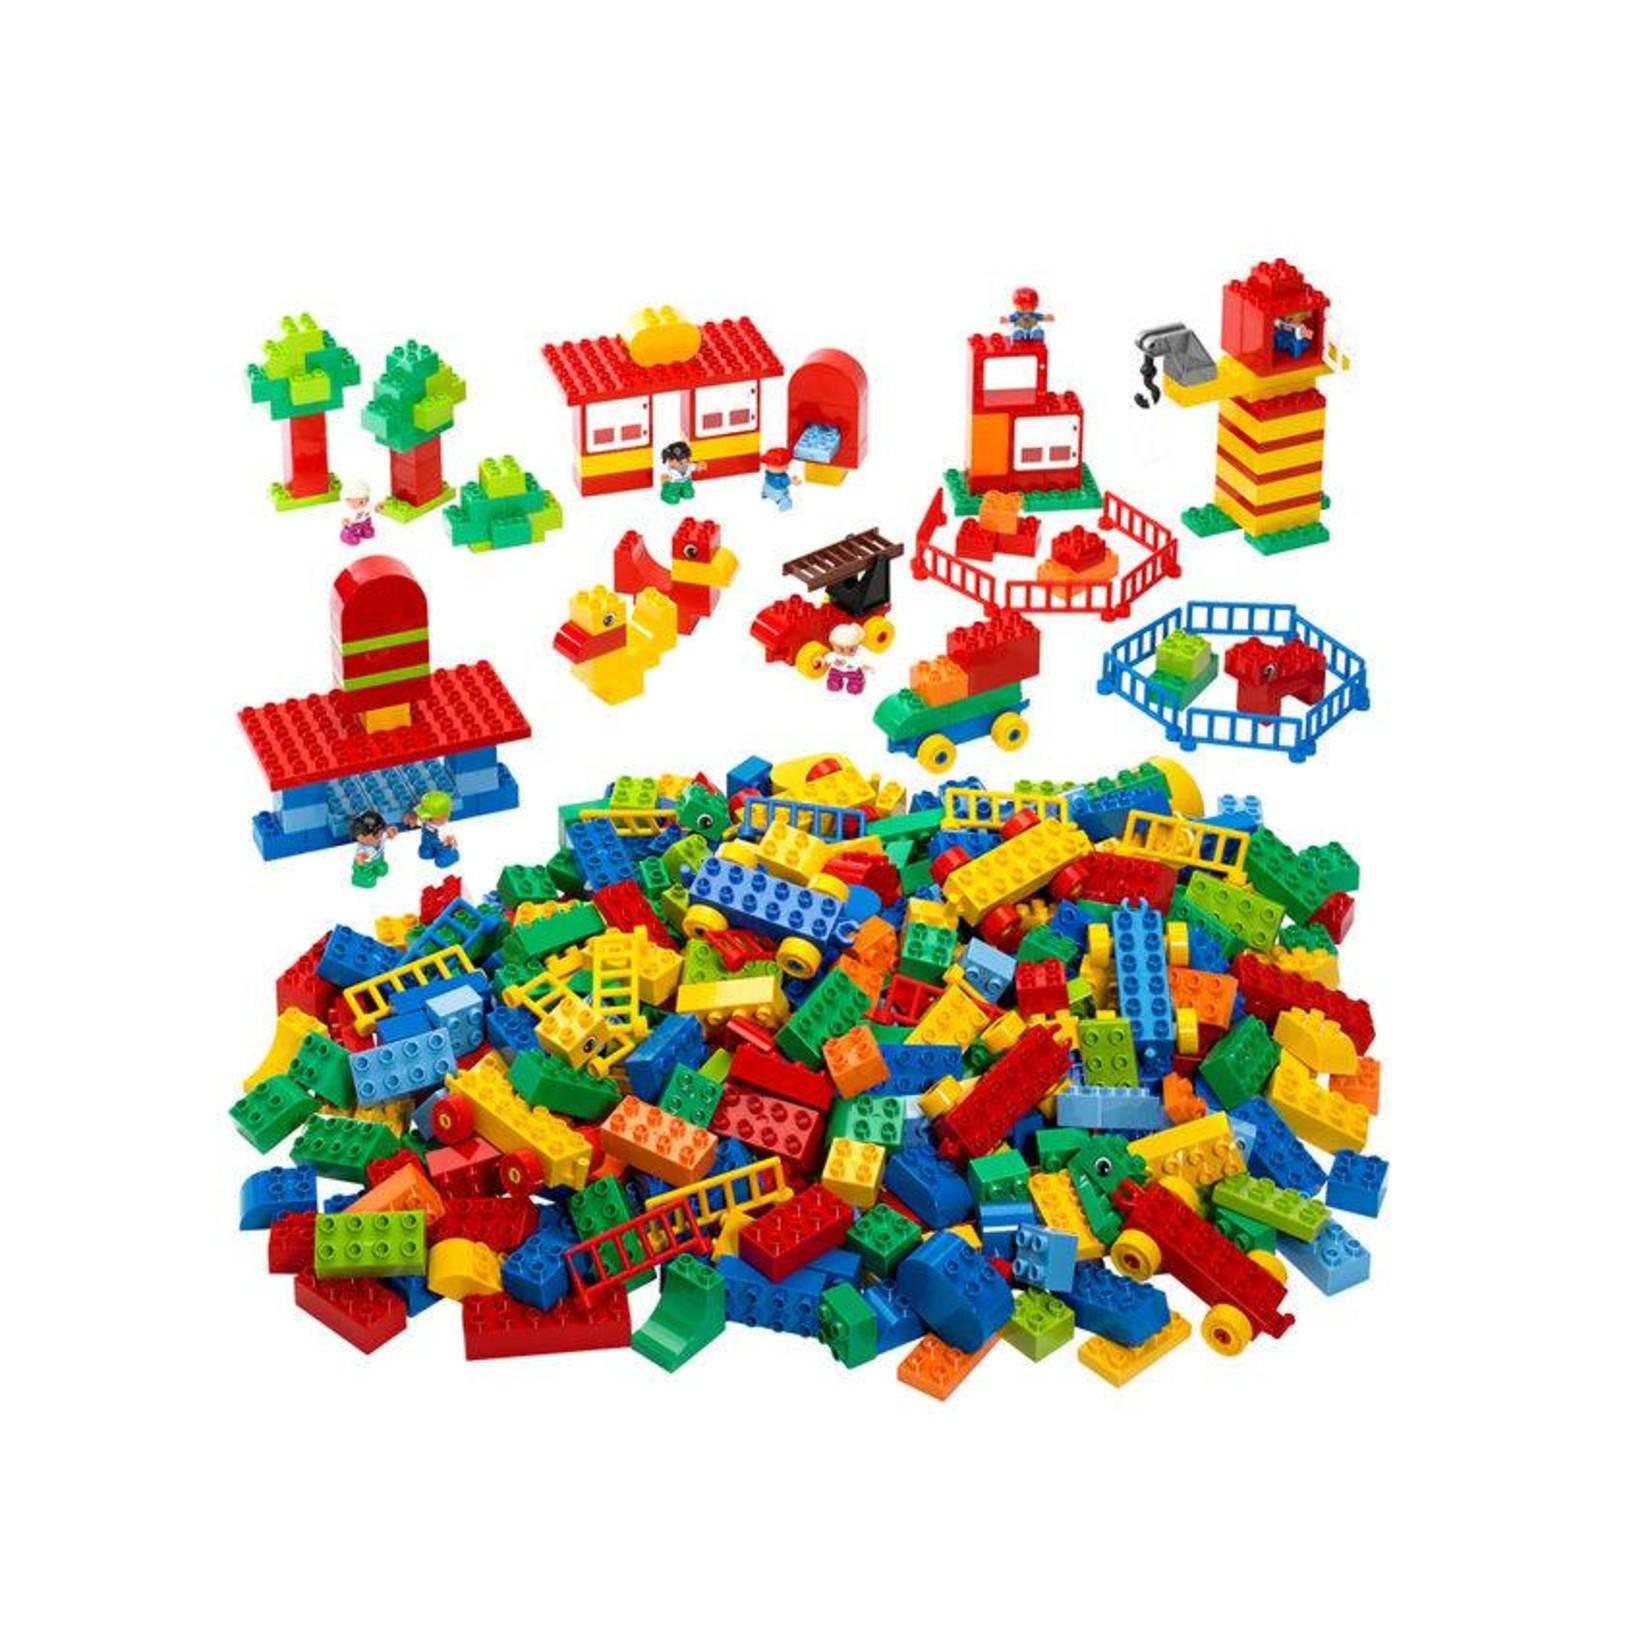 LEGO® Education XL LEGO® DUPLO® Blokkenset